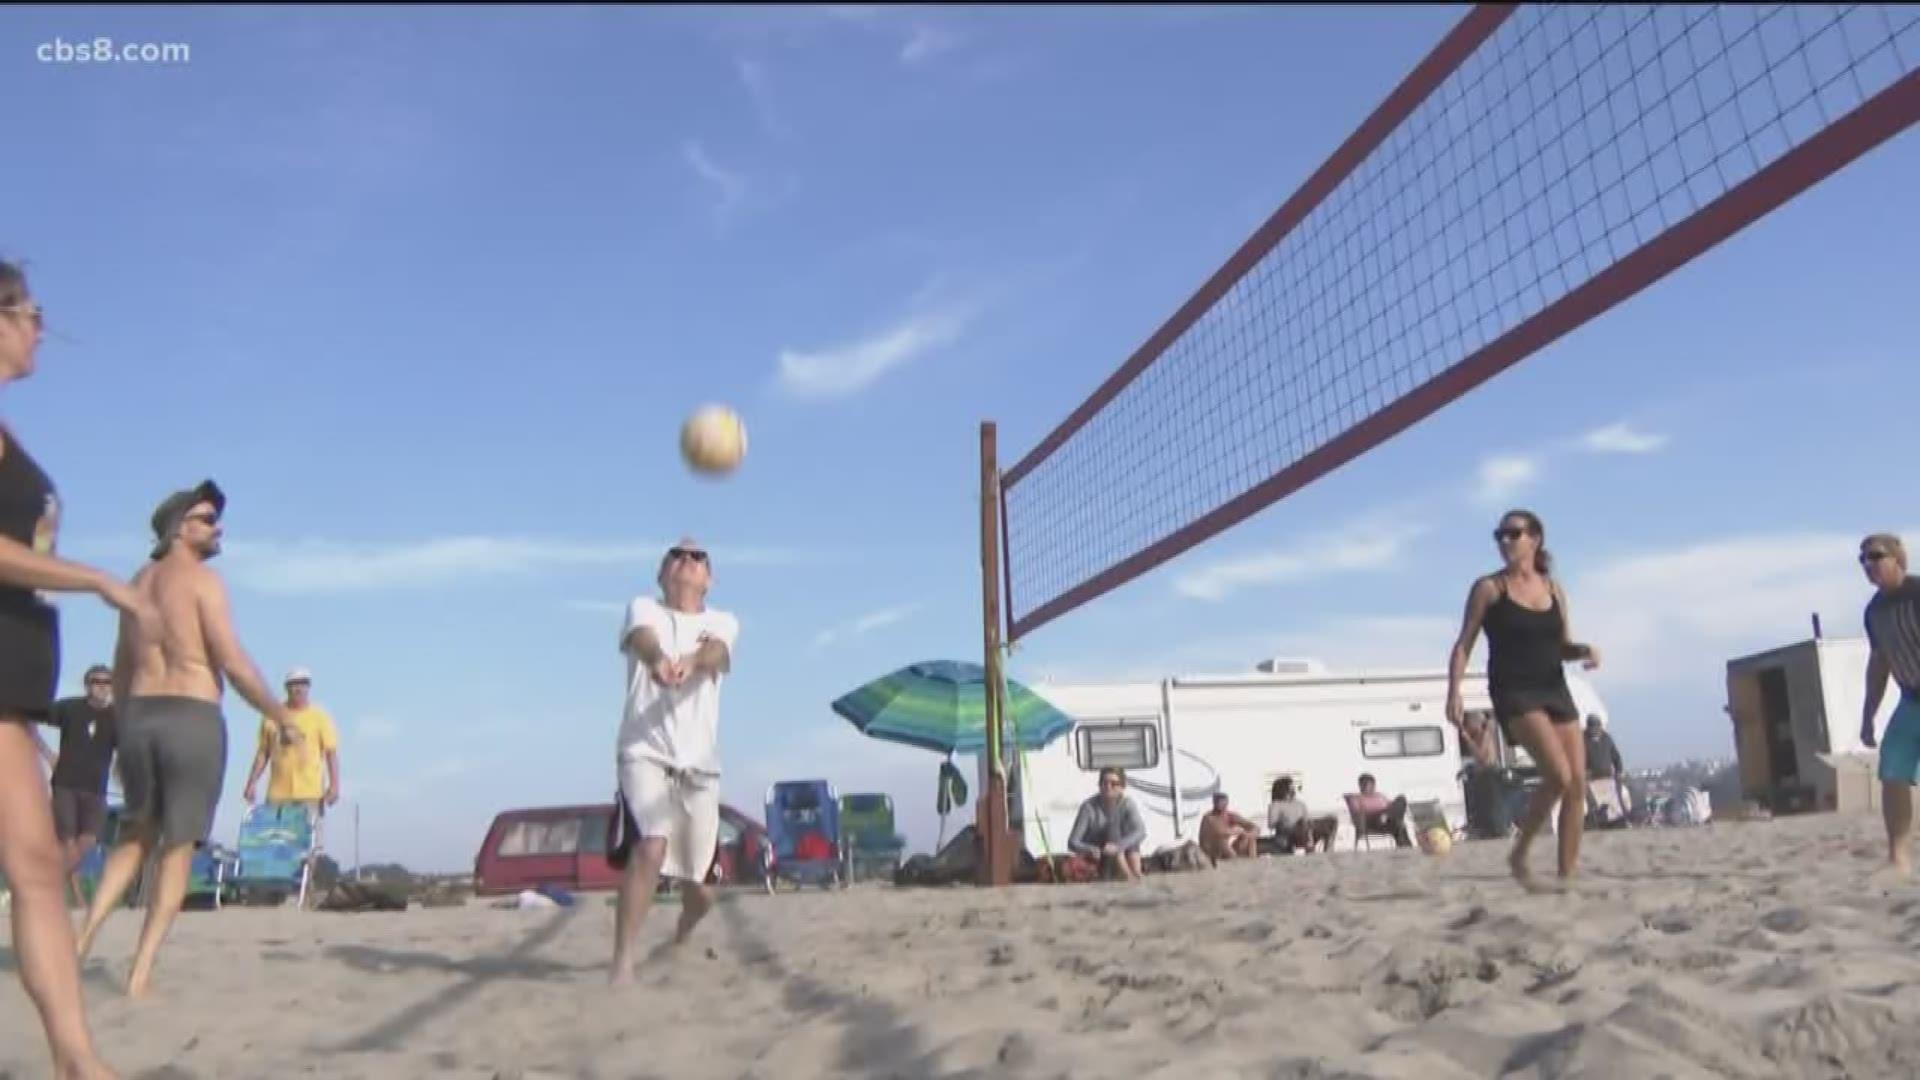 Carlsbad Volleyball Players Upset Over Park Plan Cbs8 Com